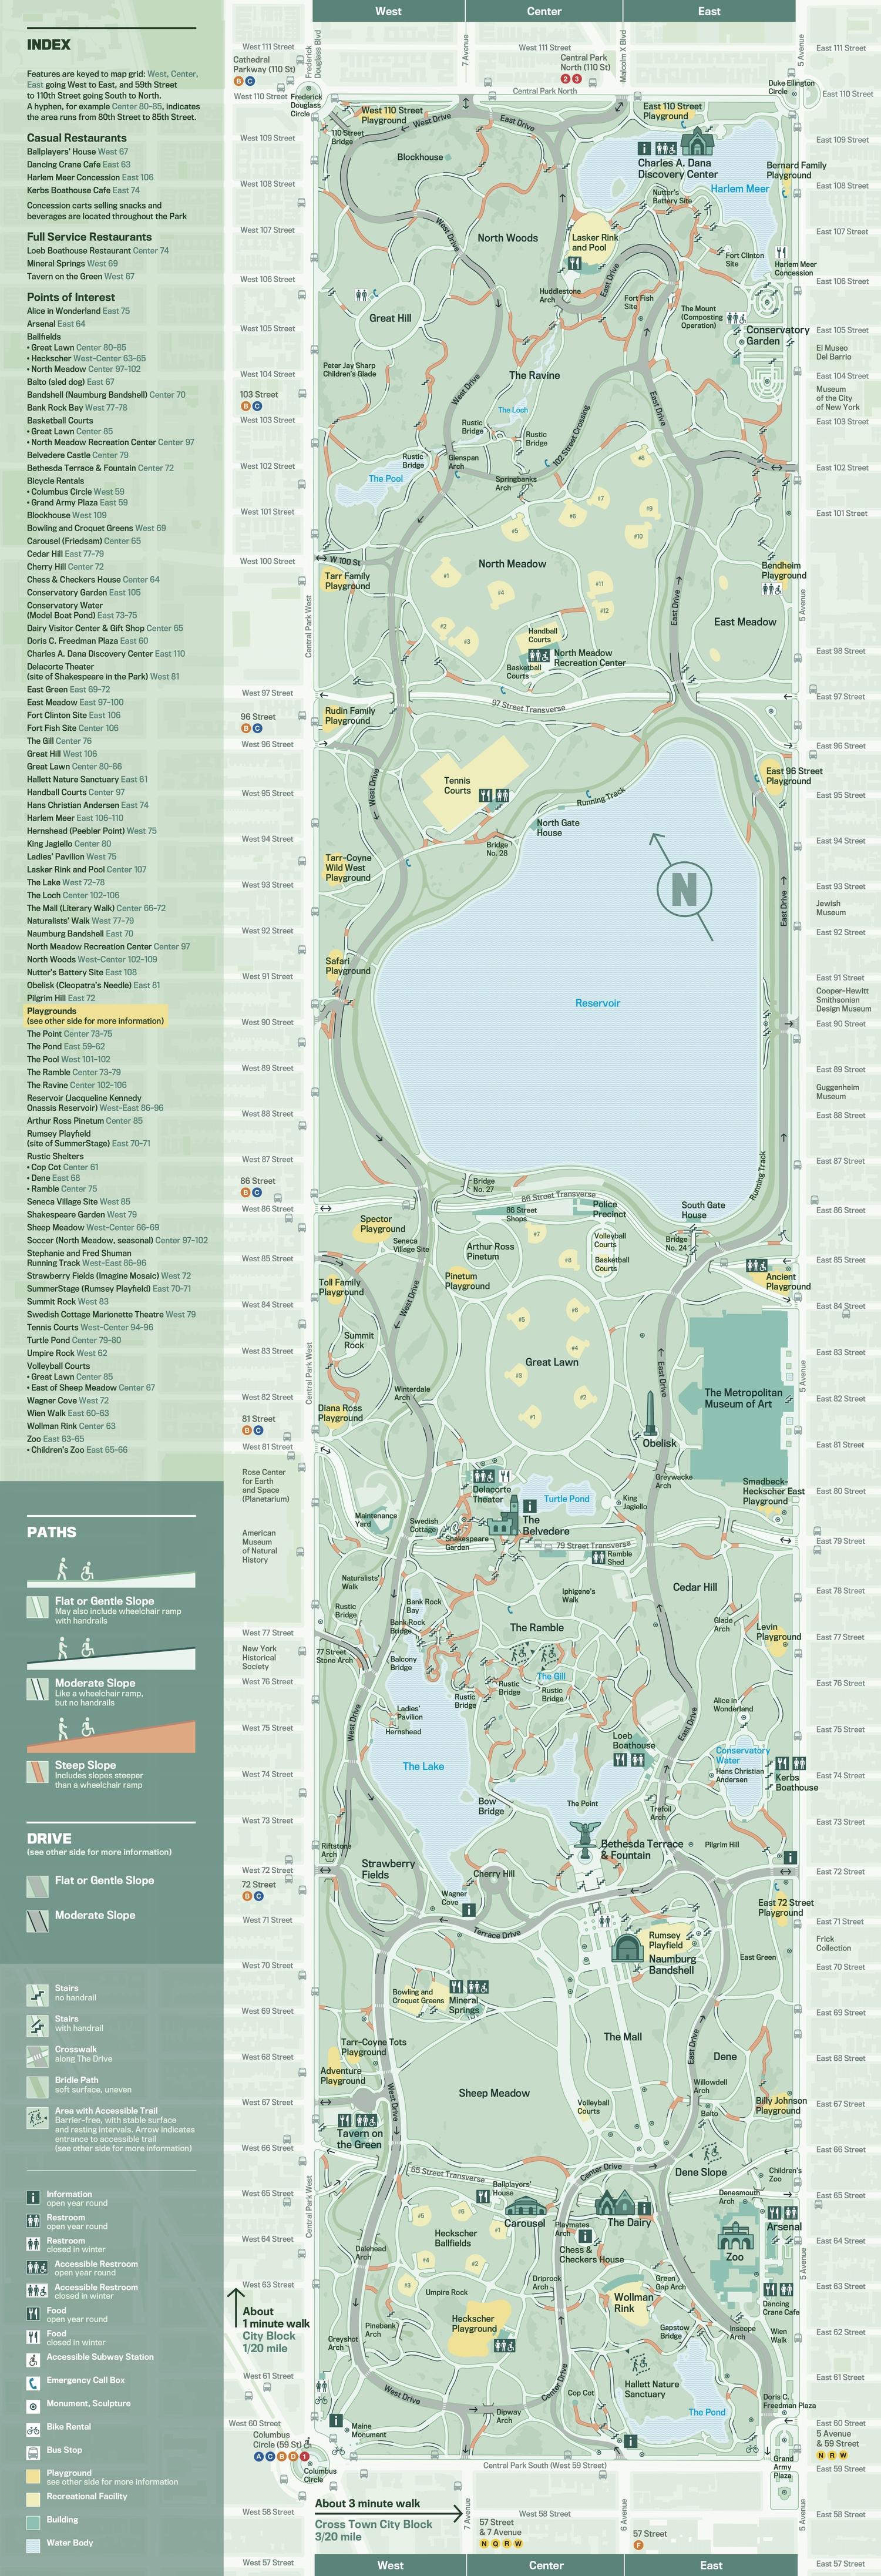 Central Park Access Map